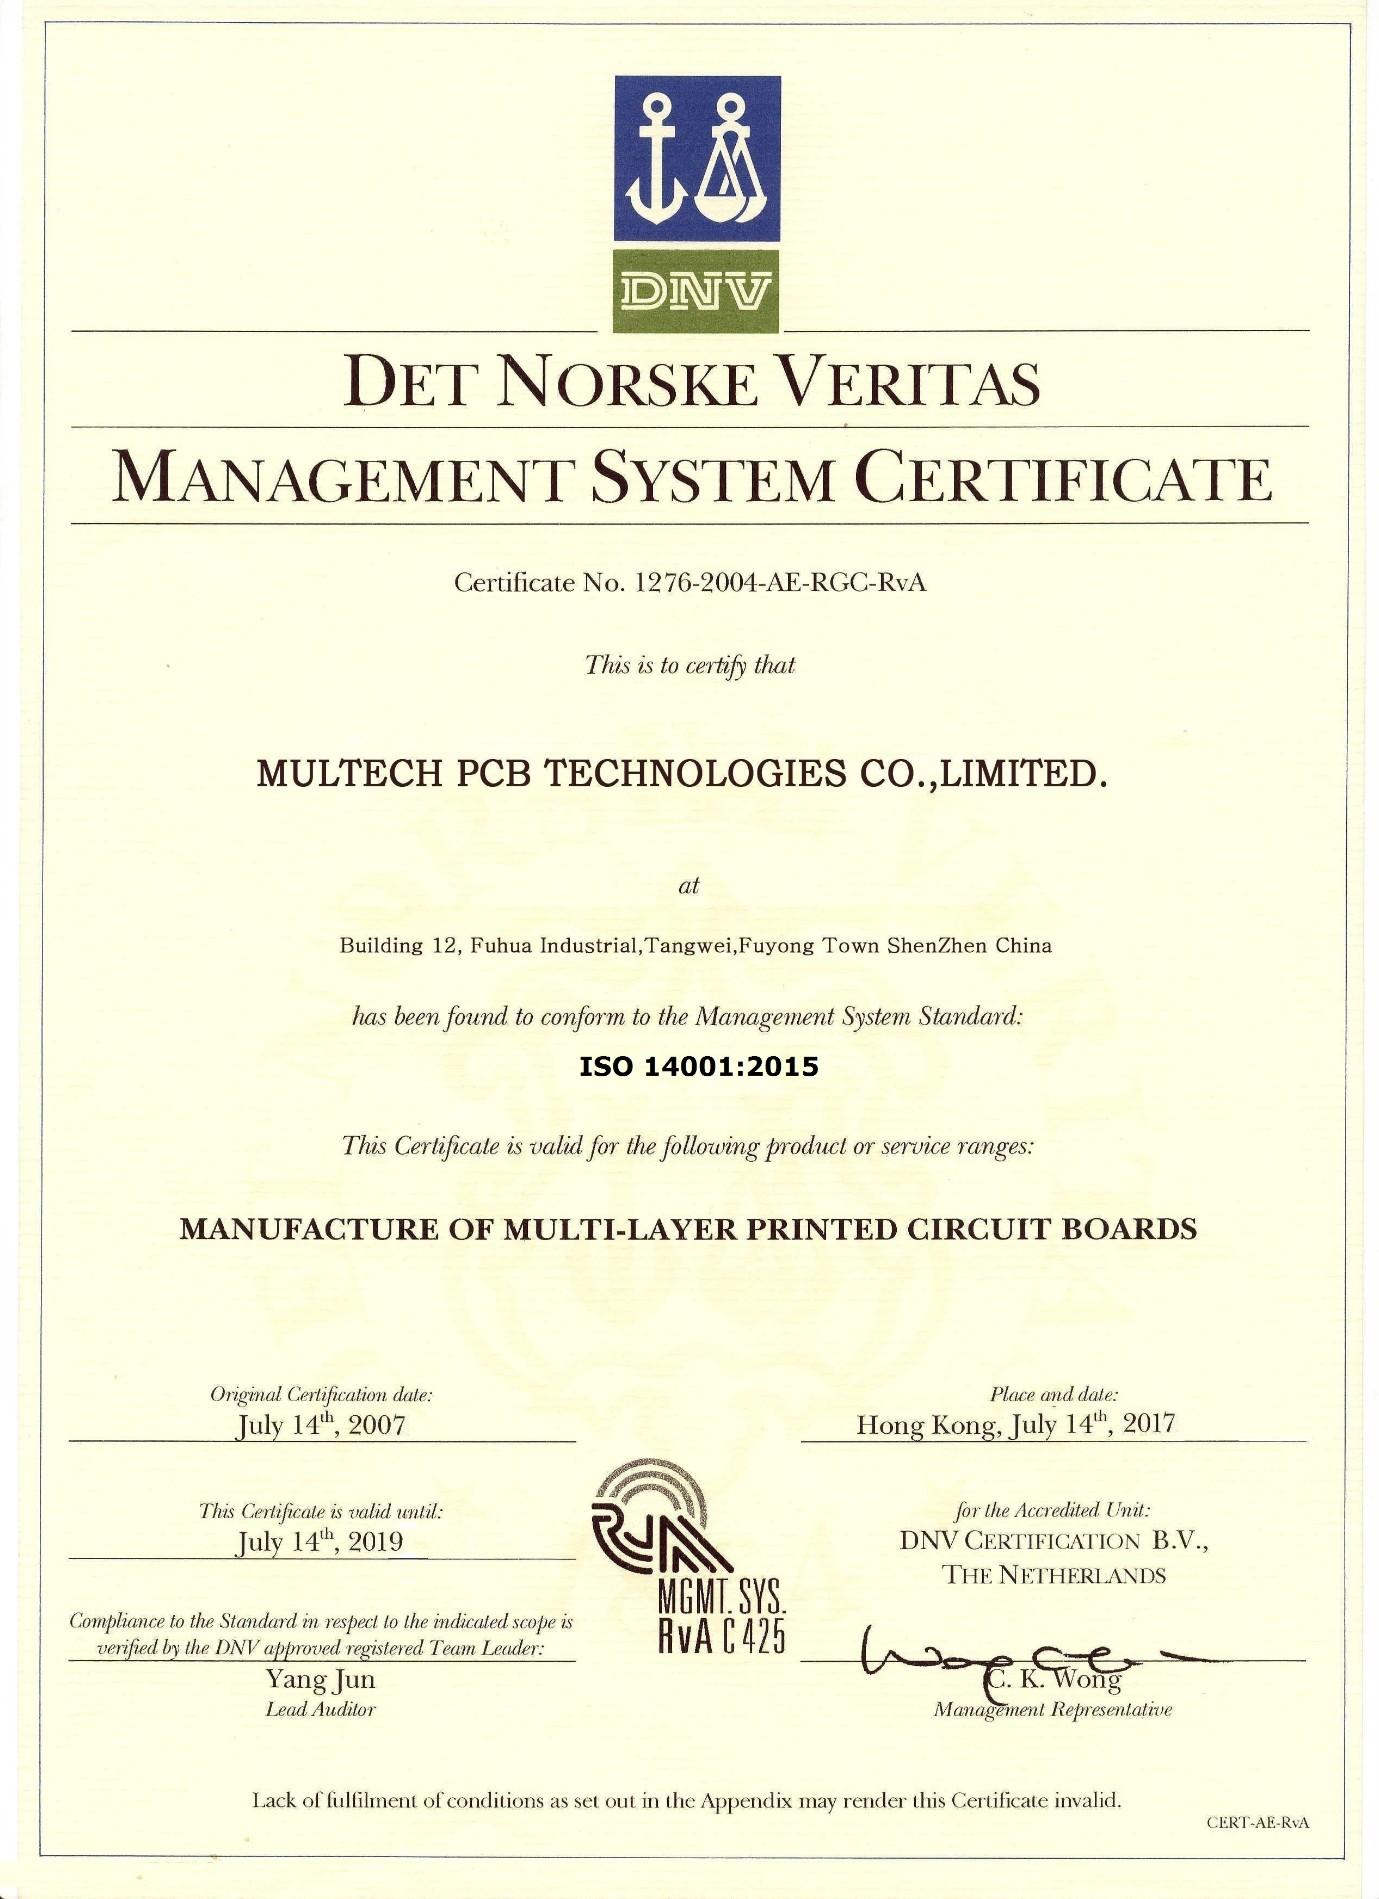 Multech ISO14001